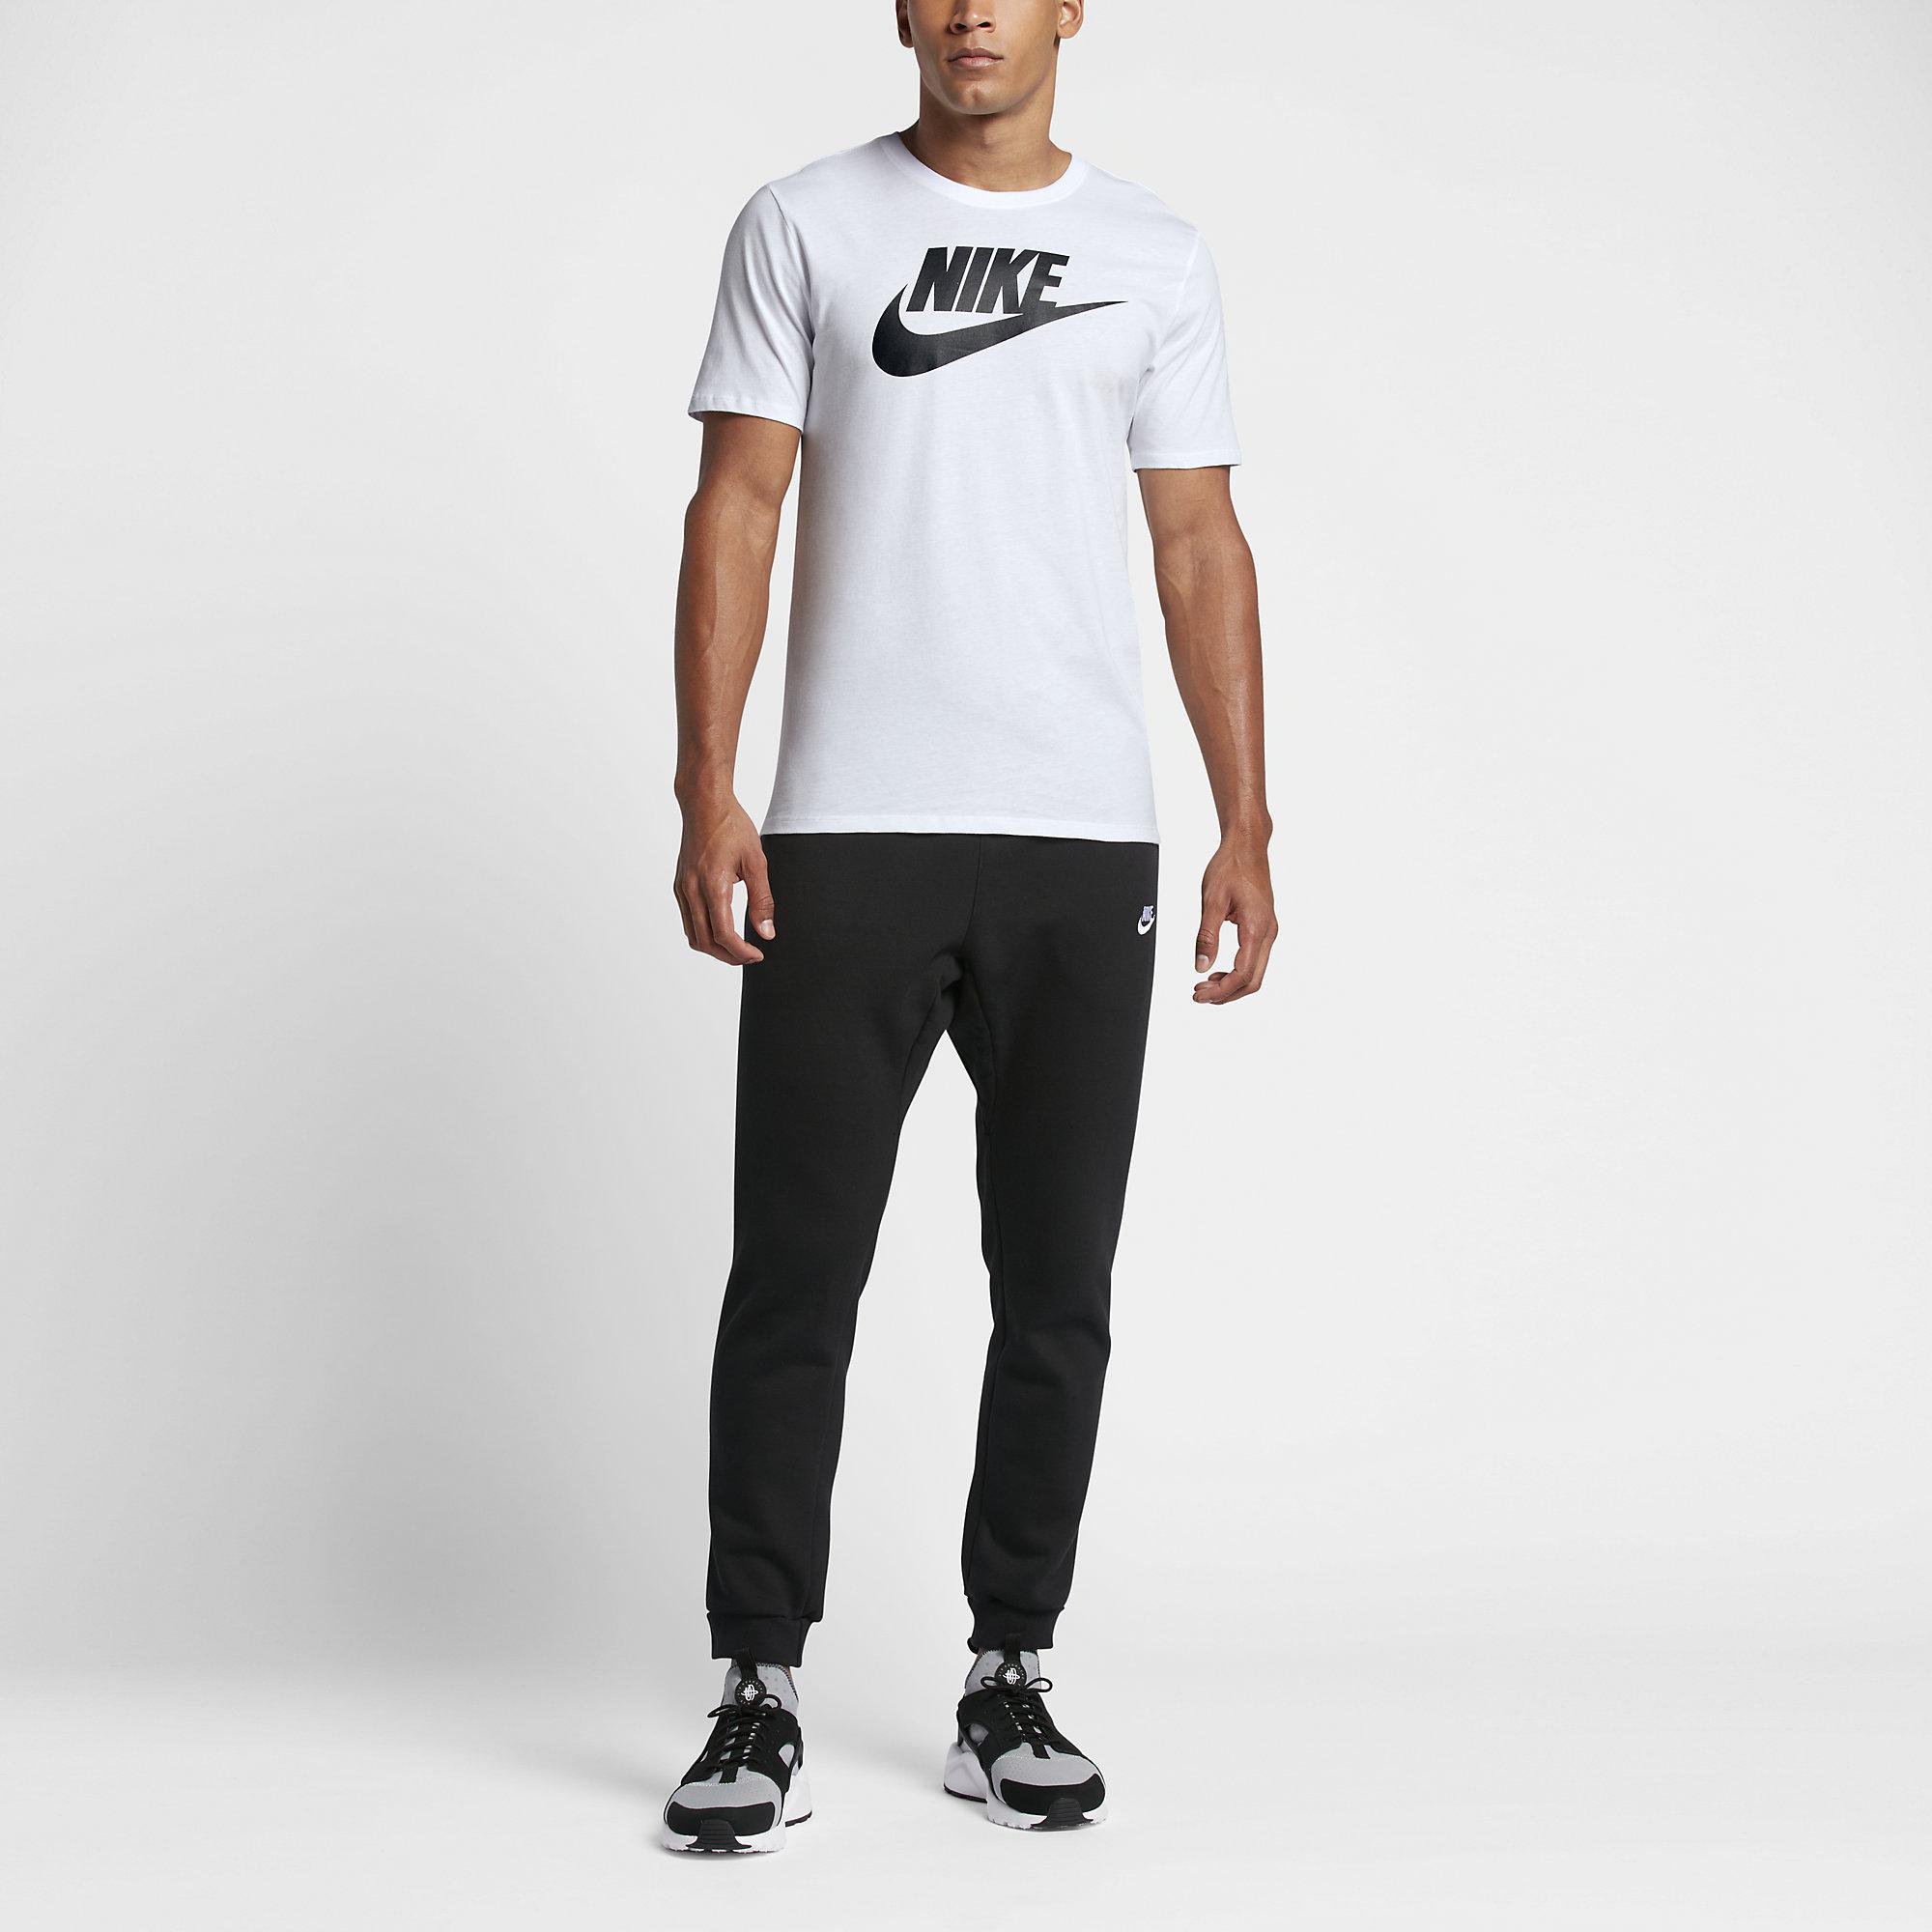 Nike Sportswear Futura Icon Herren T Shirt whiteblack 696707 104